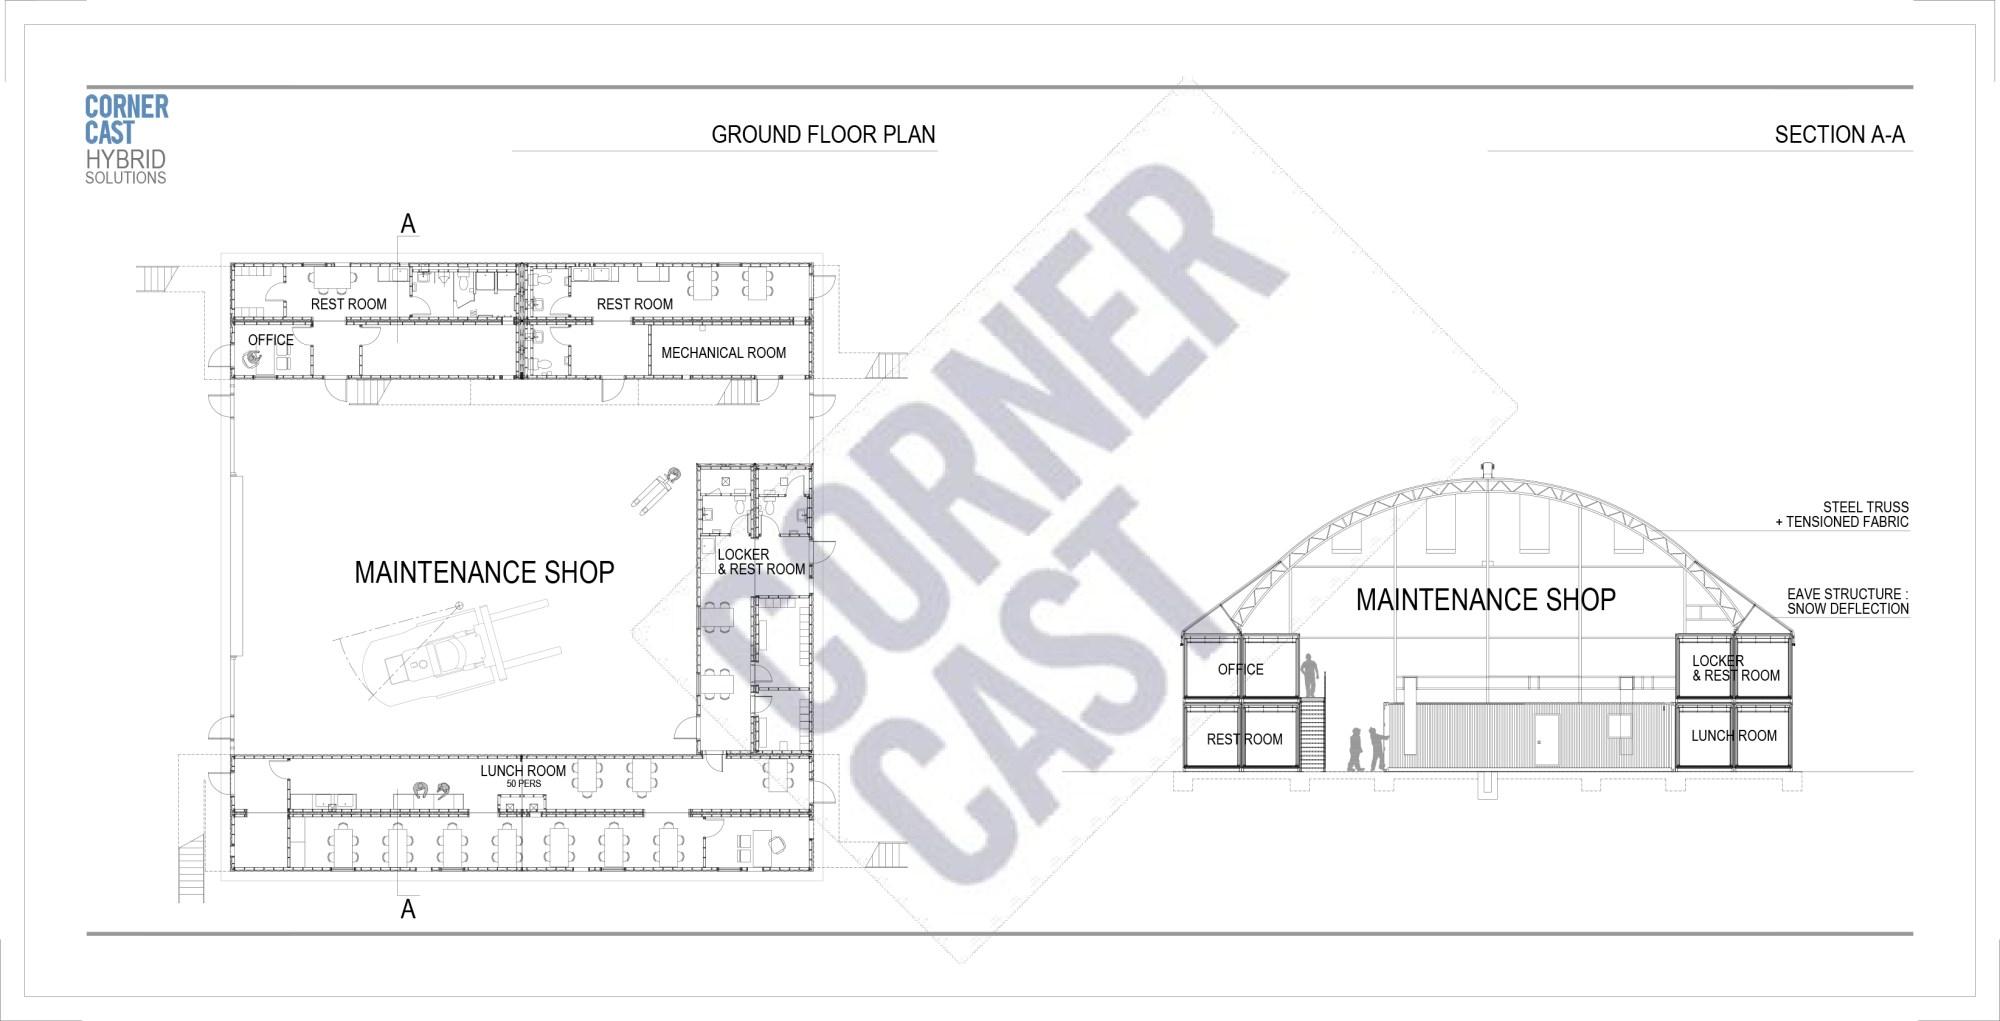 hight resolution of maintenance garage office complex corner cast corner cast diagram